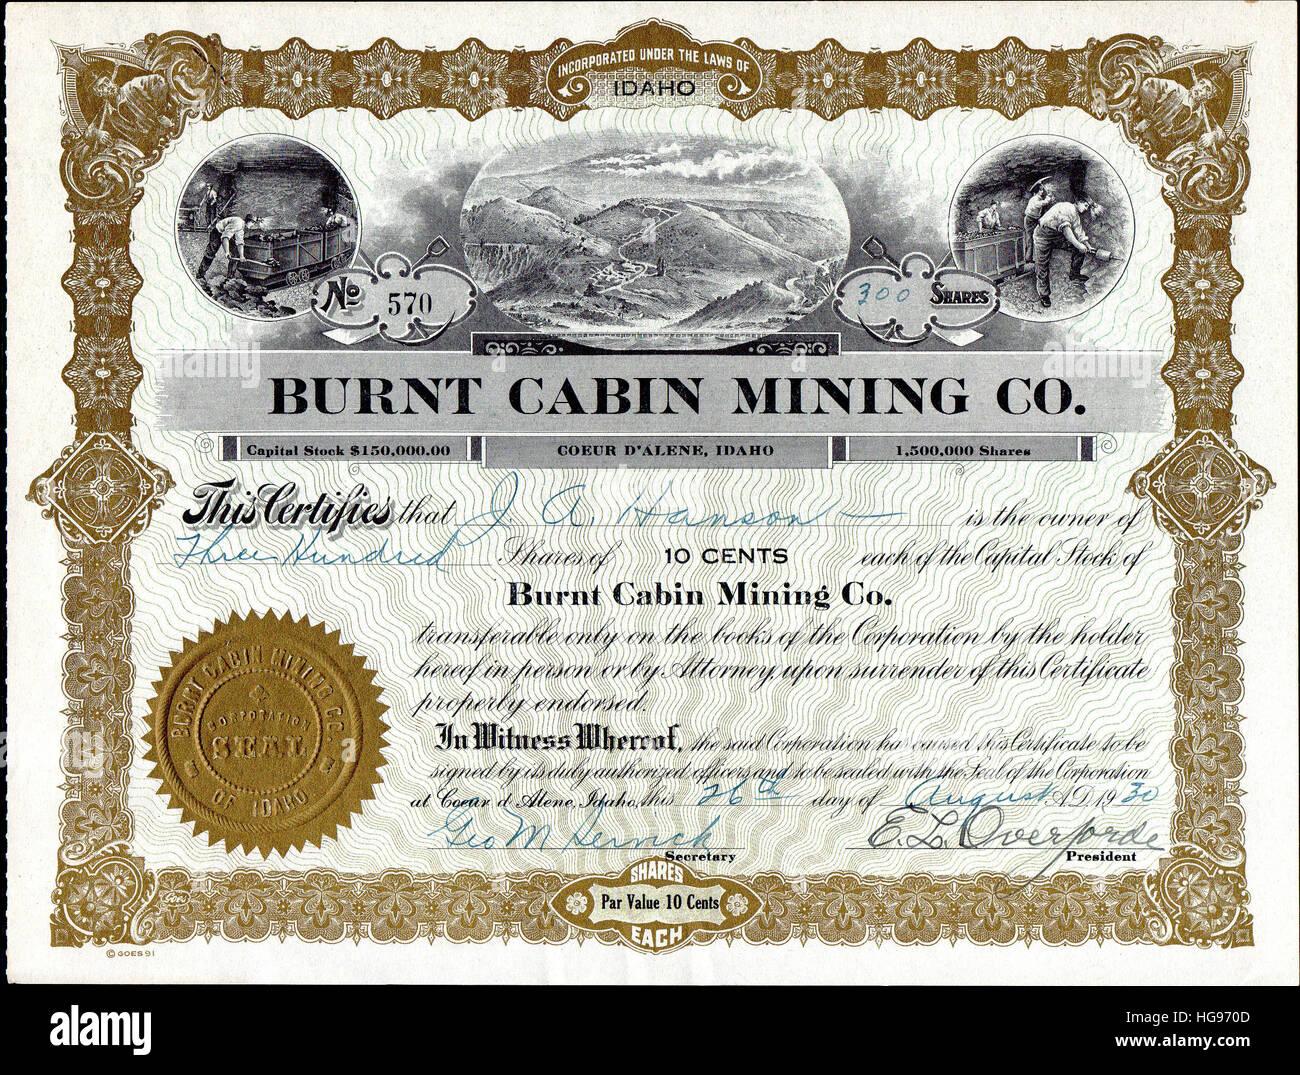 1930 Burnt Cabin Mining Company Stock Certificate - Burnt Cabin Creek - Kootenai County, Coeur D' Alene, Idaho - Stock Image